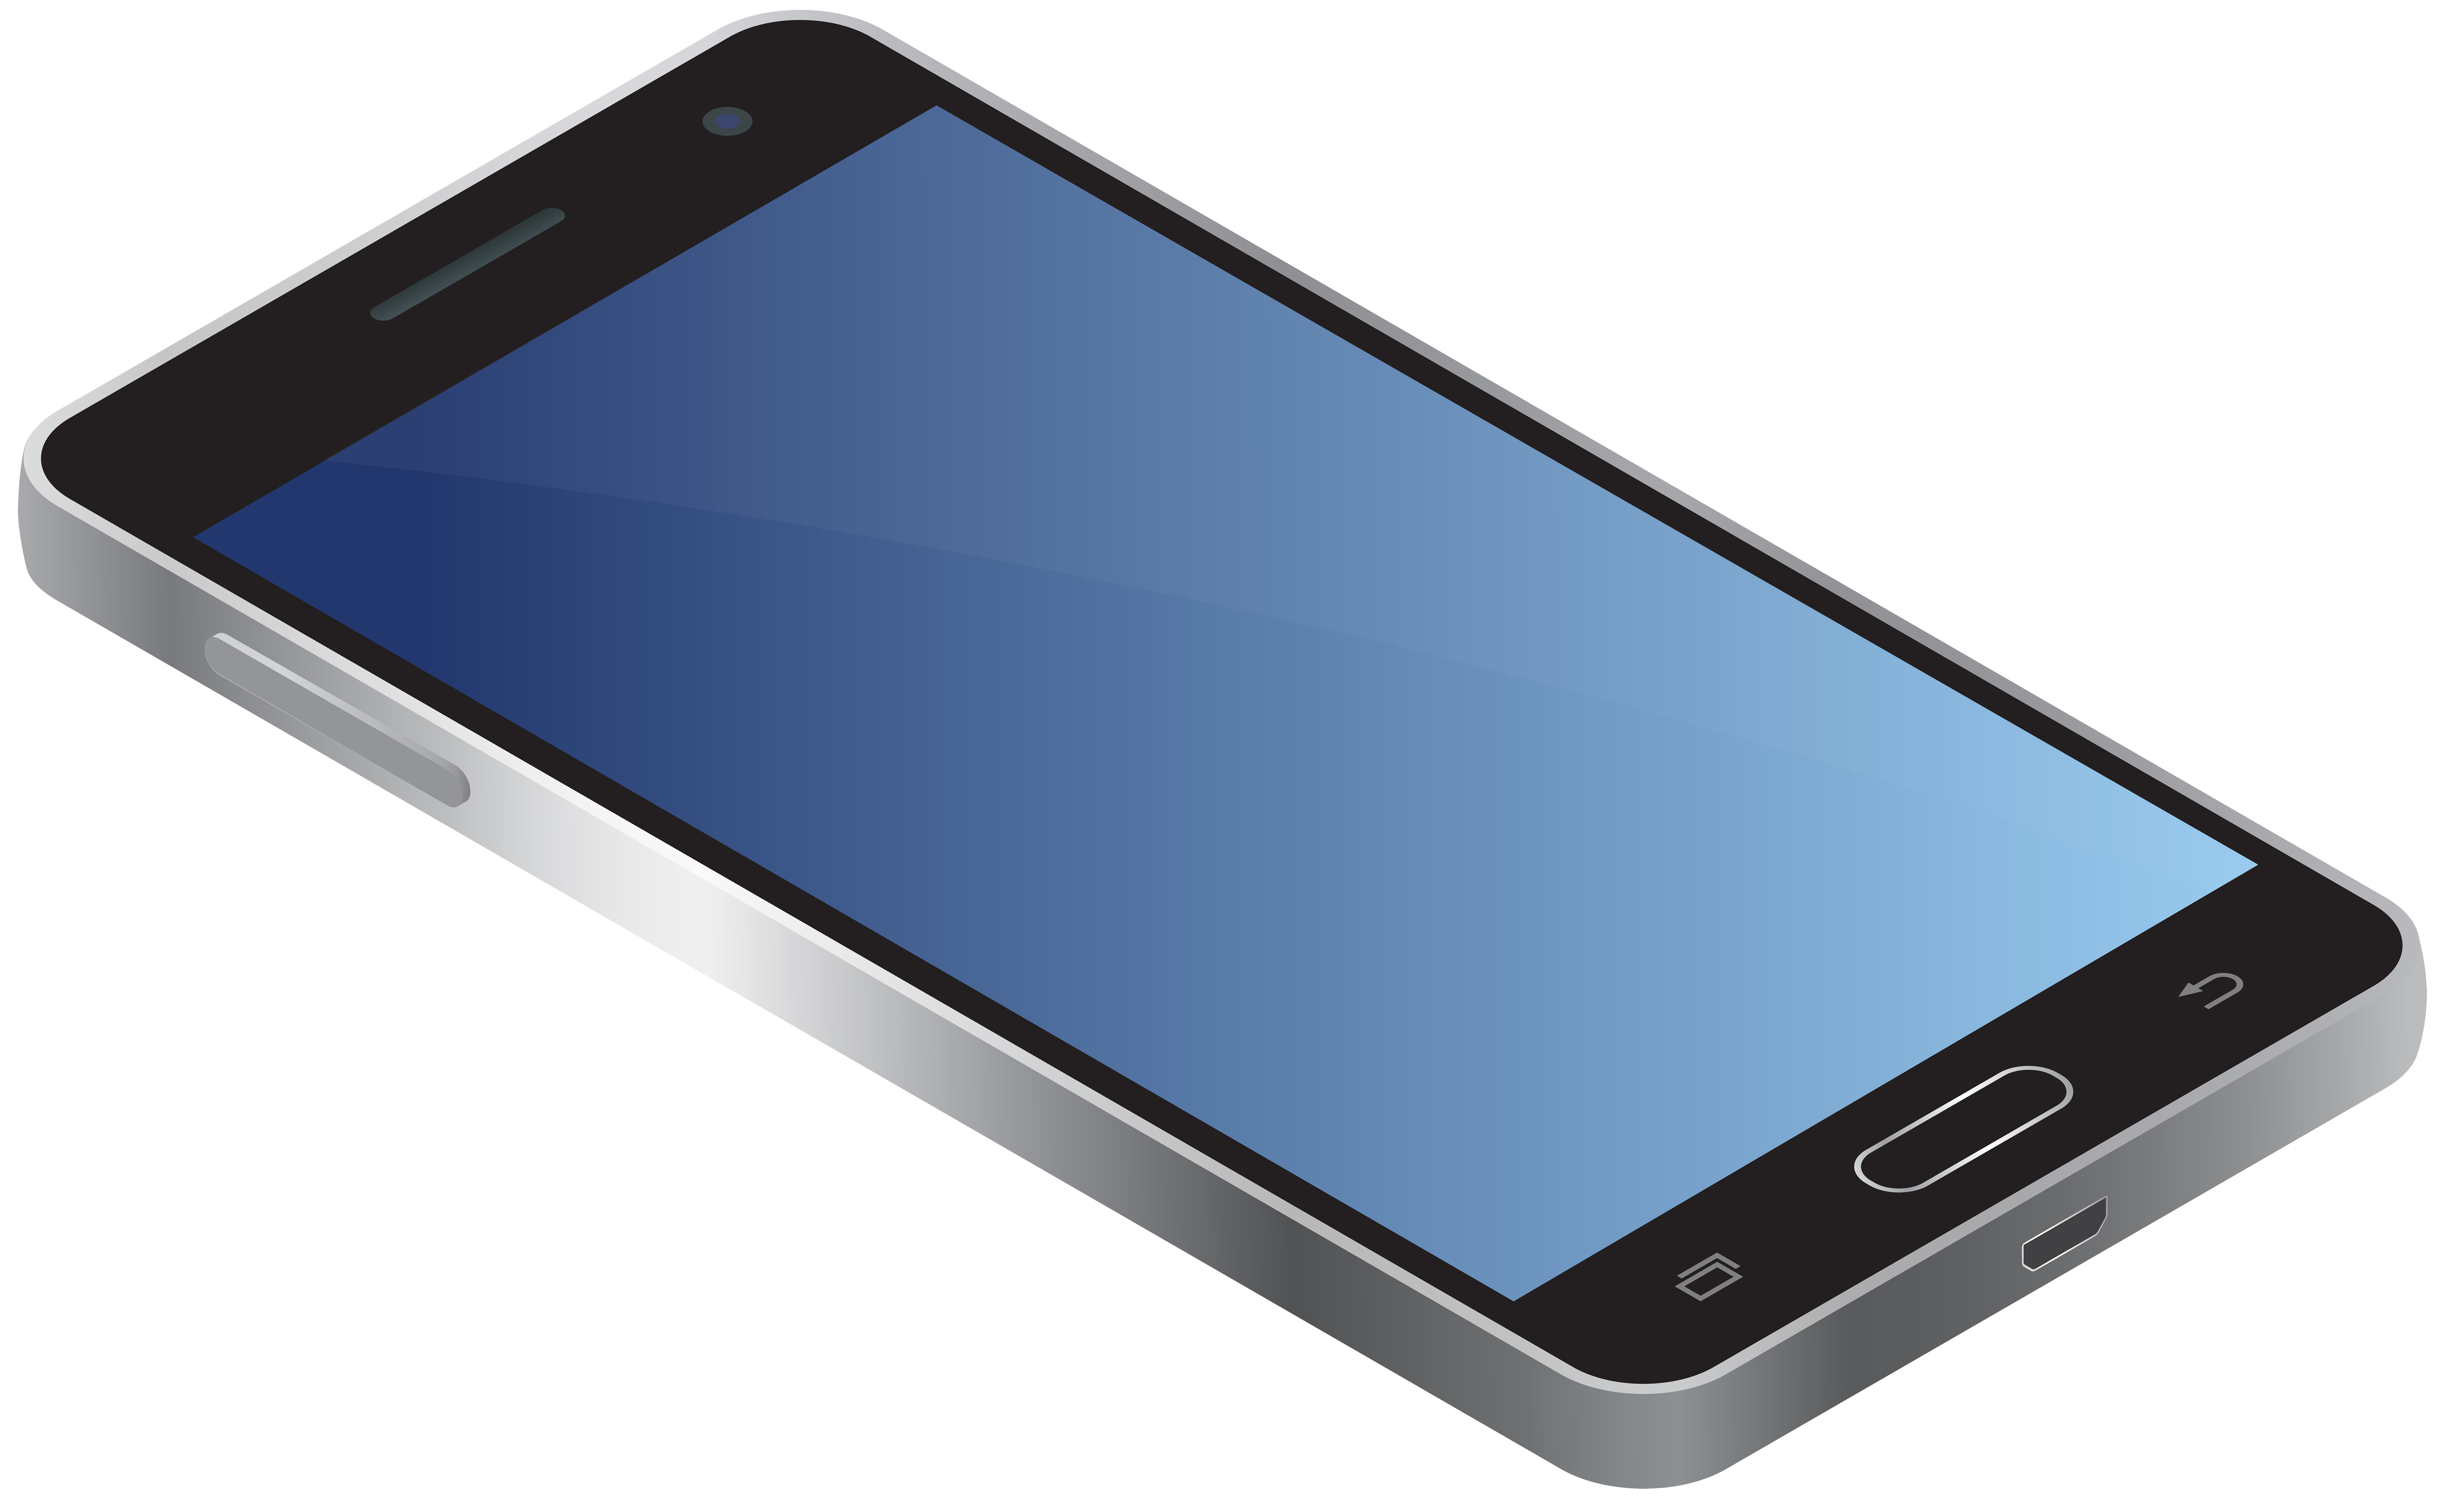 Mobile Phone Transparent PNG Clip Art Image.